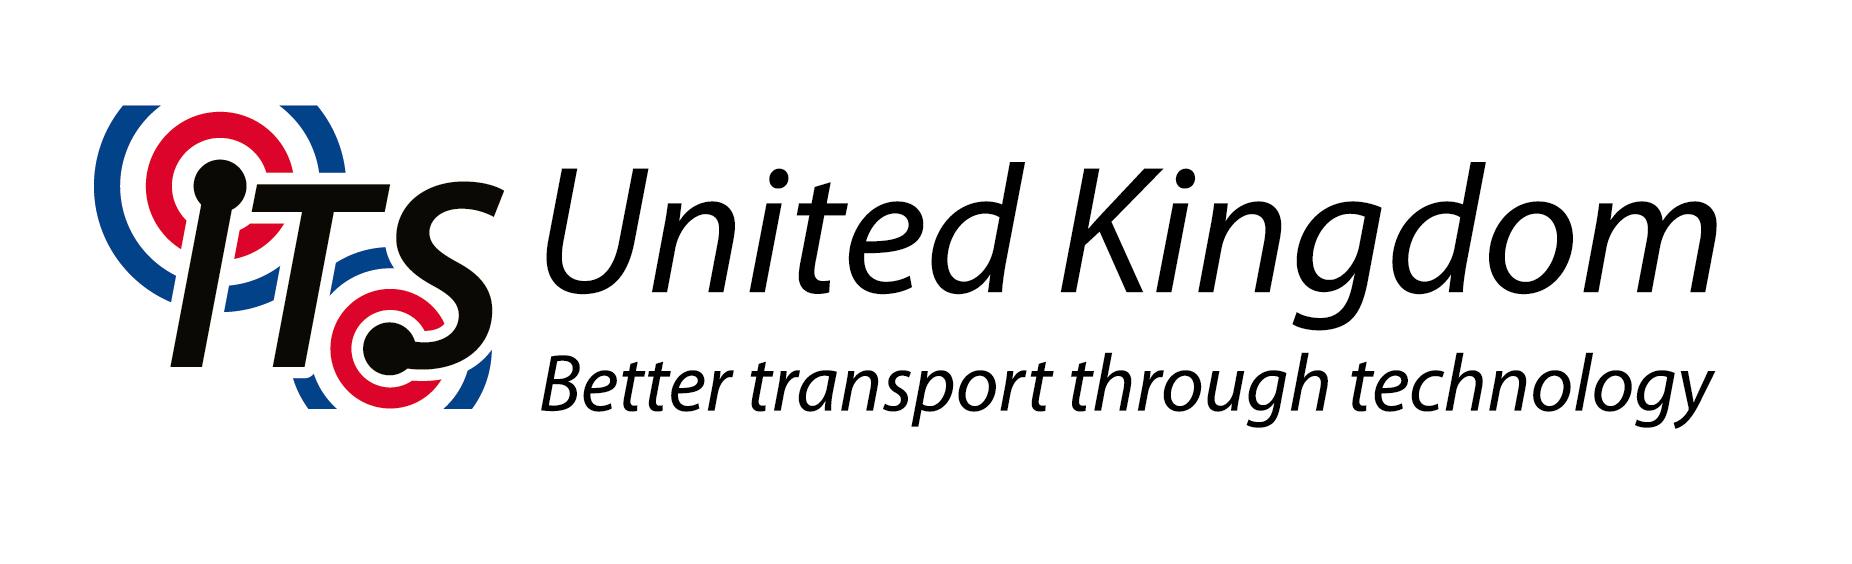 ITS United Kingdom